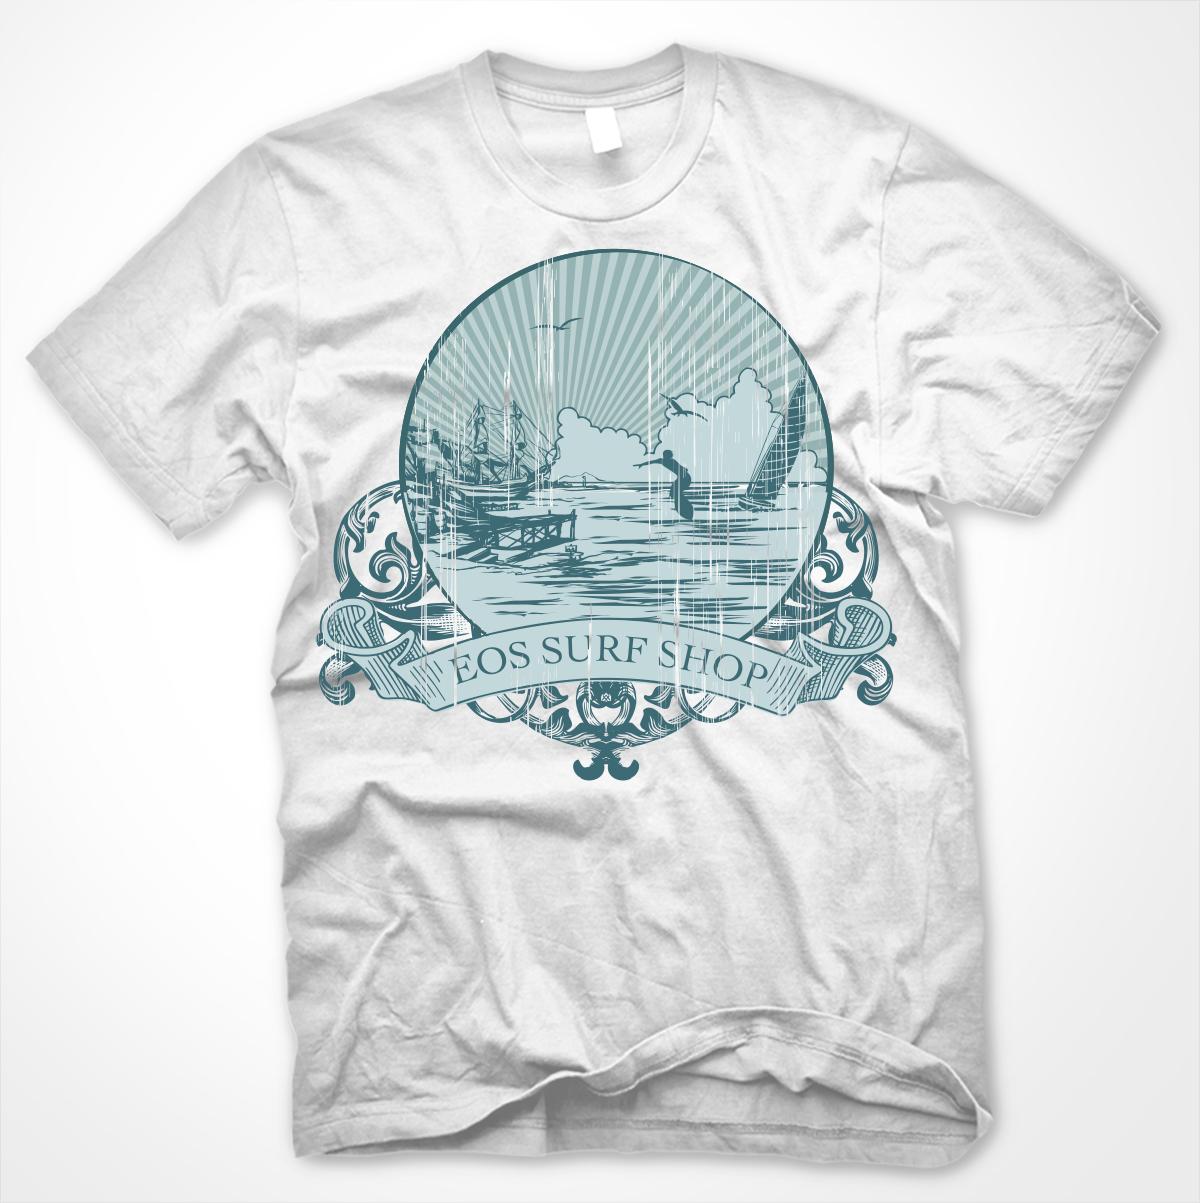 T shirt design for eos surf shop by jaden ranen design for Surf shop tee shirts